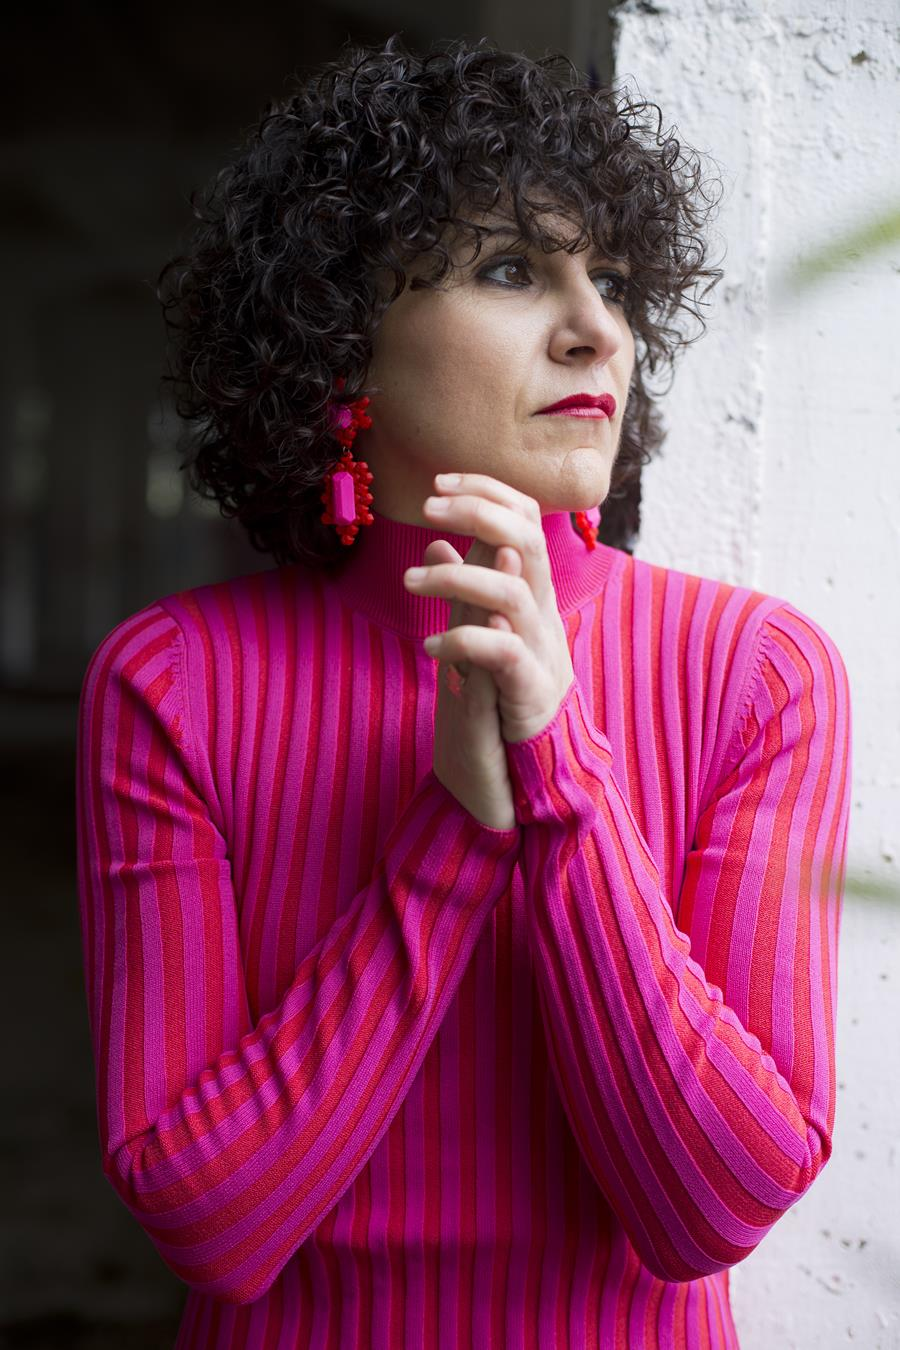 Rebeca Valdivia, asesora de imagen, personal shopper, estilista, stilist, influencer, Donostia, San Sebastián, Miss Clov, la blogger indie, influencer, dress, vestido canalé, rosa, pink, rizos, curls, tomboystyle